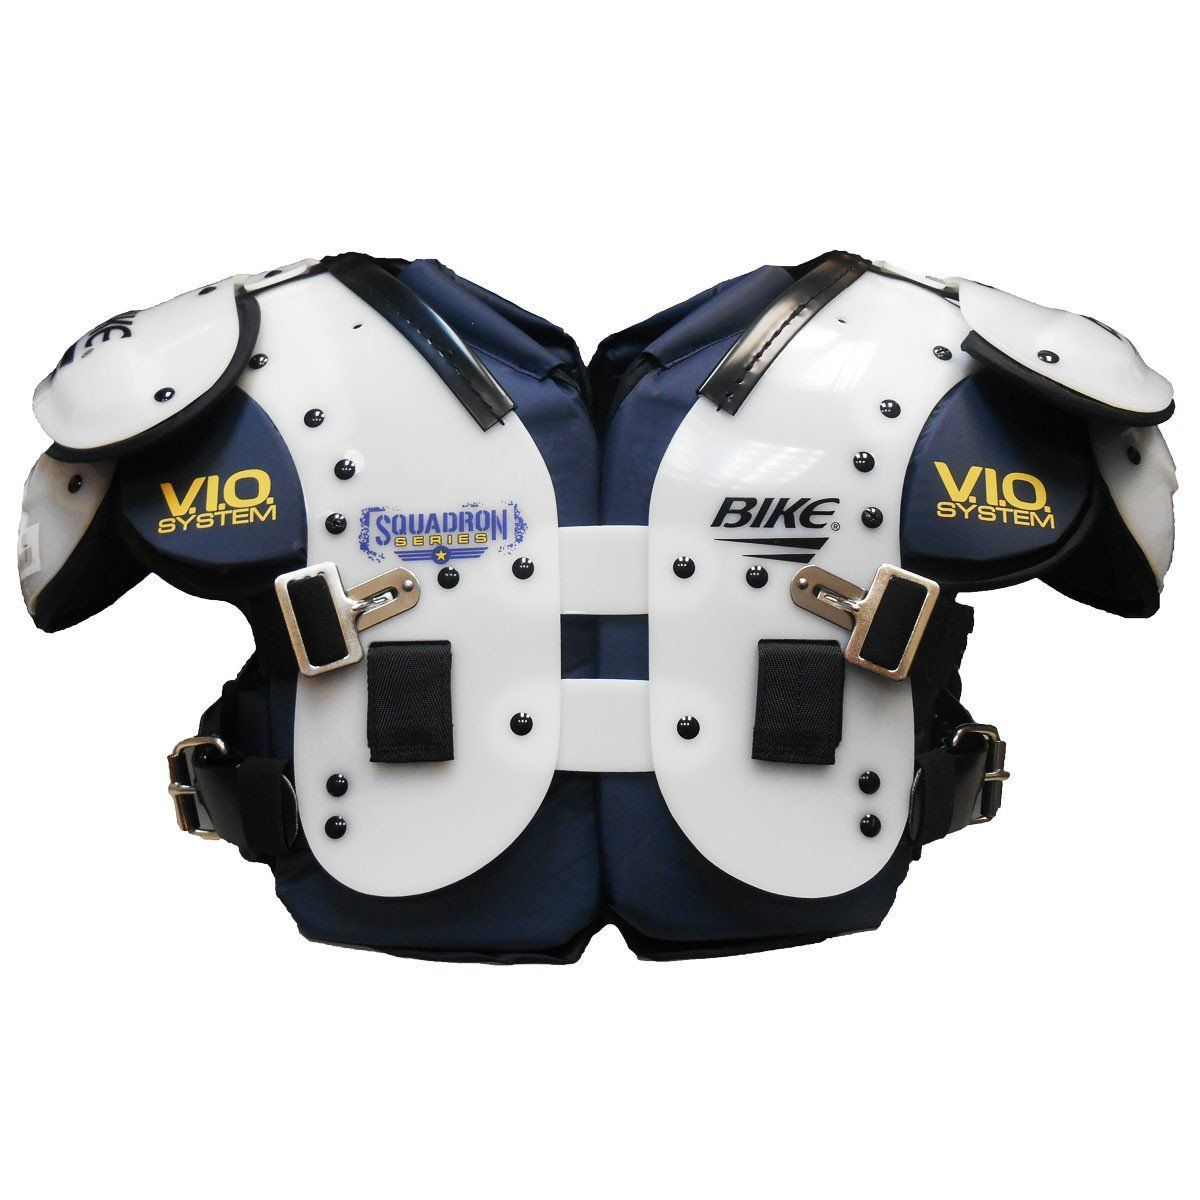 Bike adult squadron series flat multipurpose shoulder